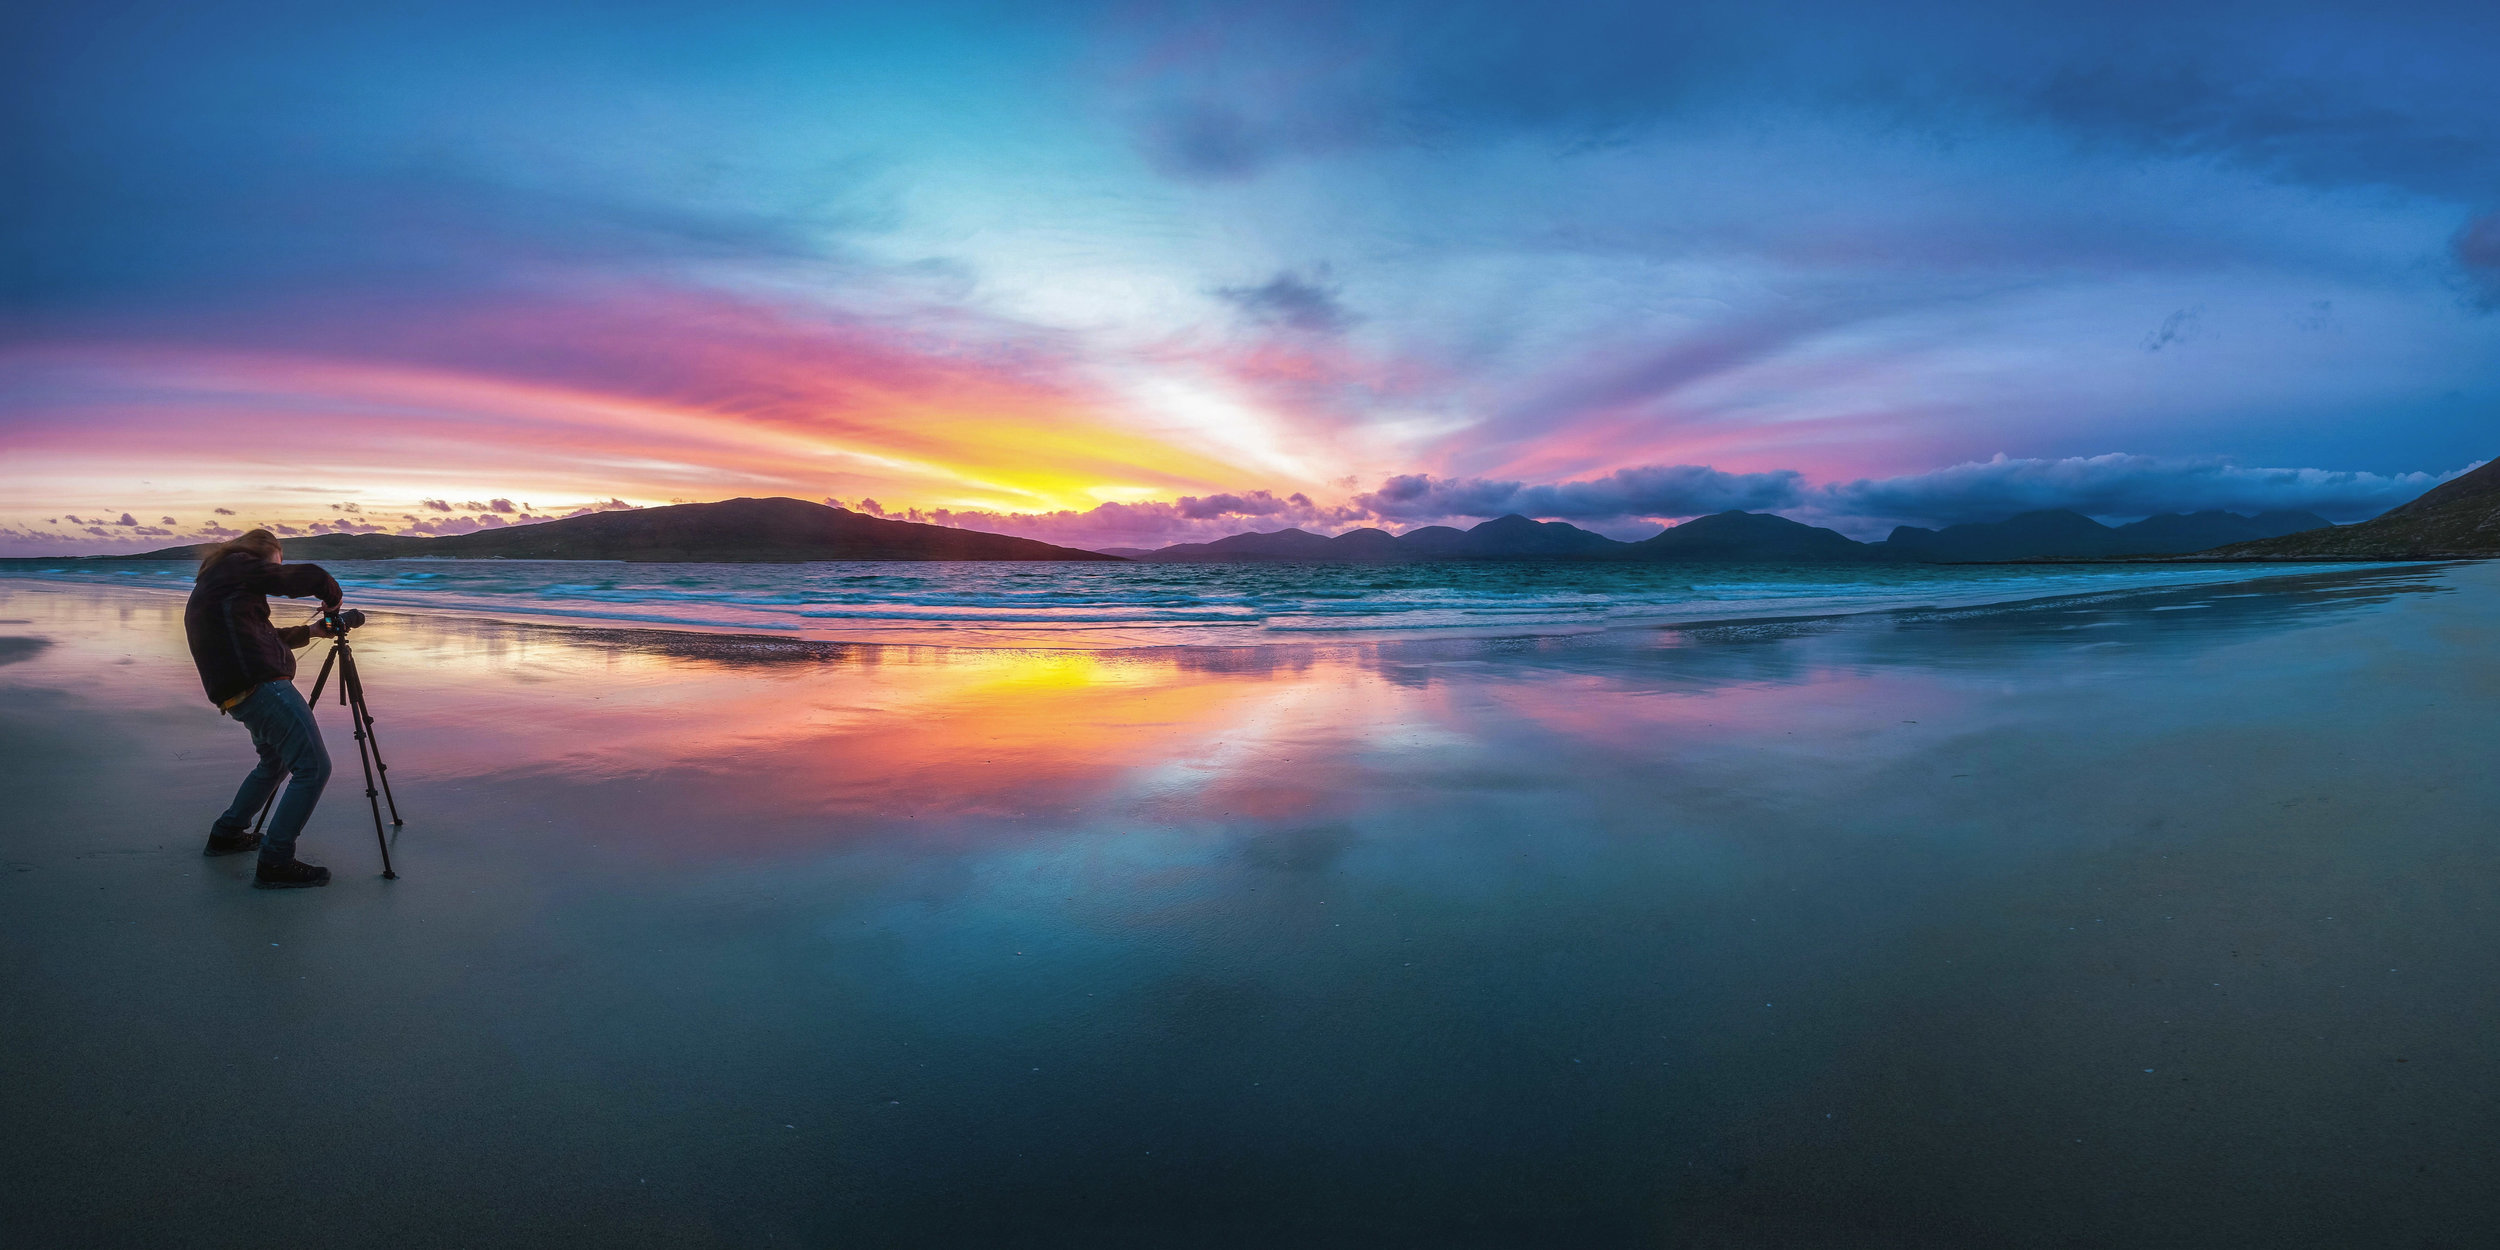 Sunset on the Isle of Harris